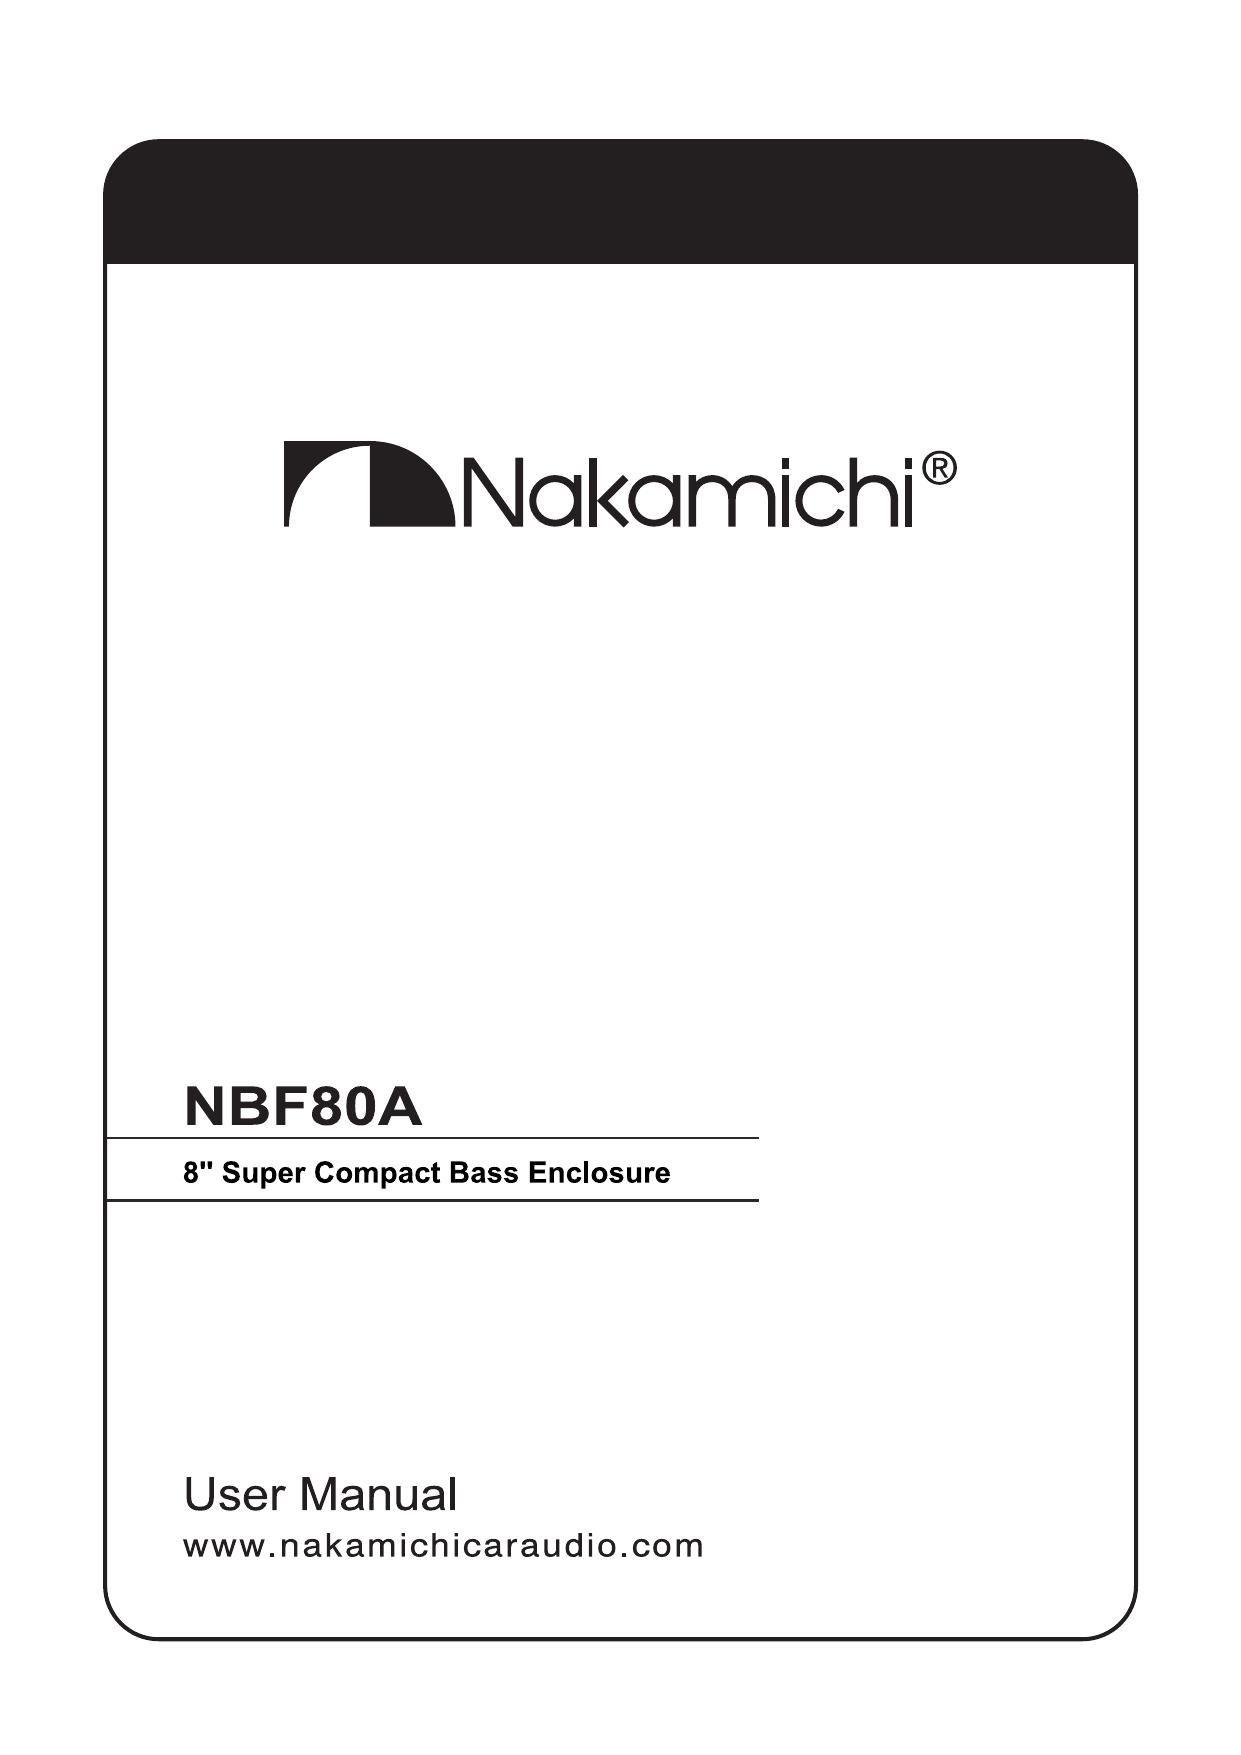 Free Download Nakamichi Nbf 80a Owners Manual